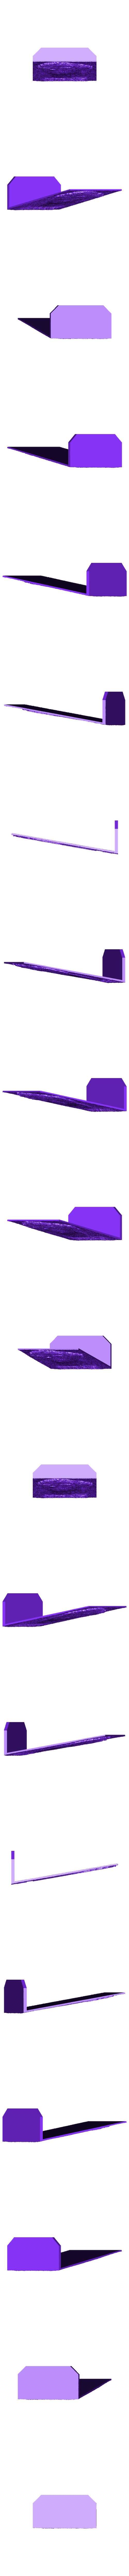 PaulDiracLithophane.stl Download free STL file Paul Dirac Lihophane • Design to 3D print, 3DWP